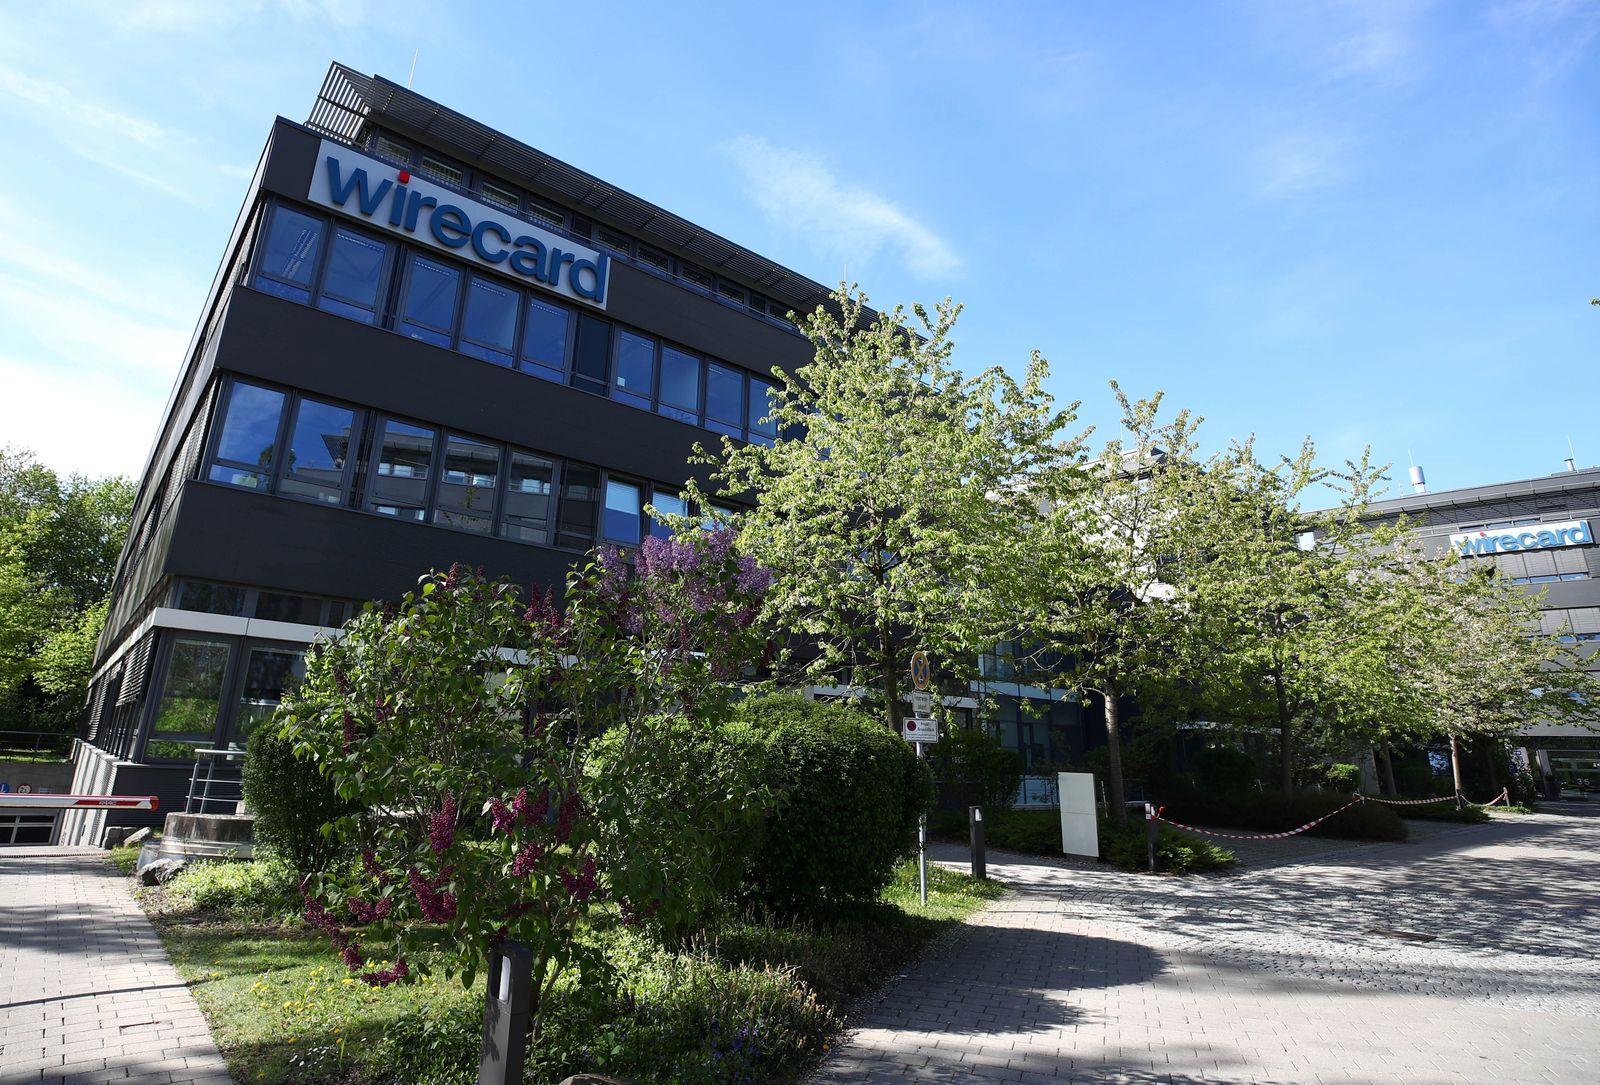 The headquarters of Wirecard AG is seen in Aschheim near Munich